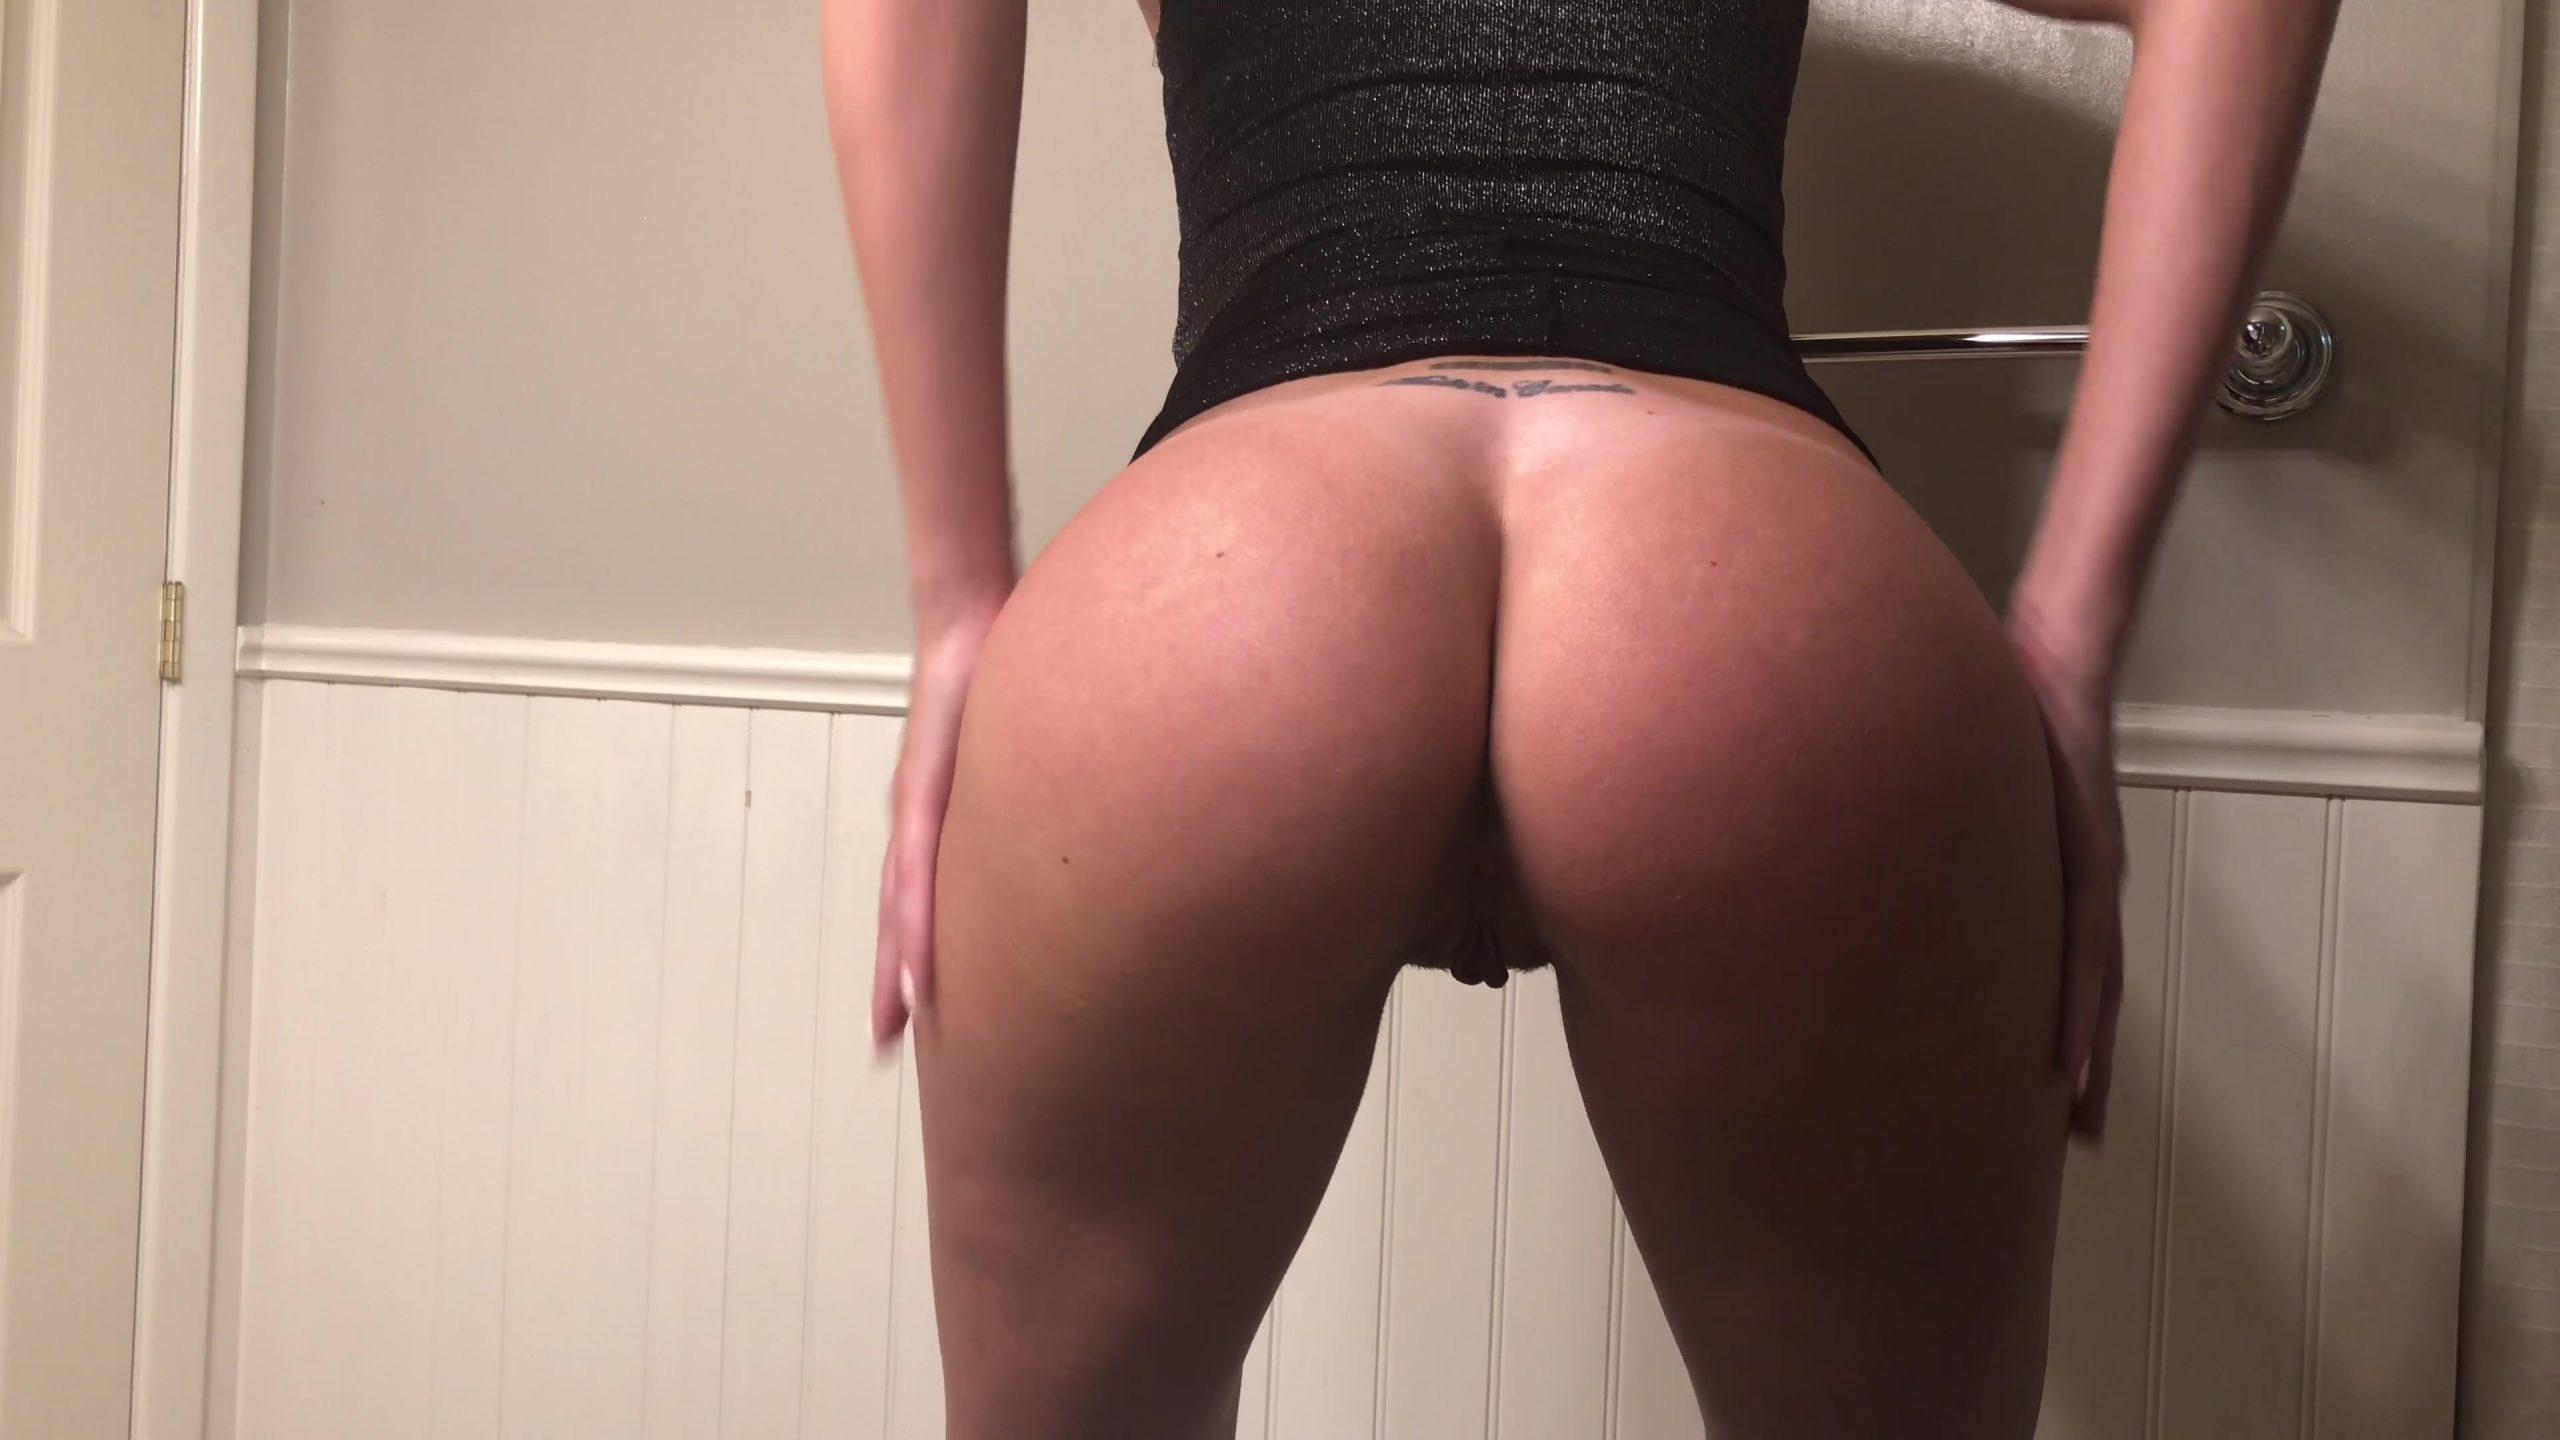 Tina_Amazon_-_Sexy_Dress_Creamy_Shit_On_A_Plate_-_4K.00000.jpg